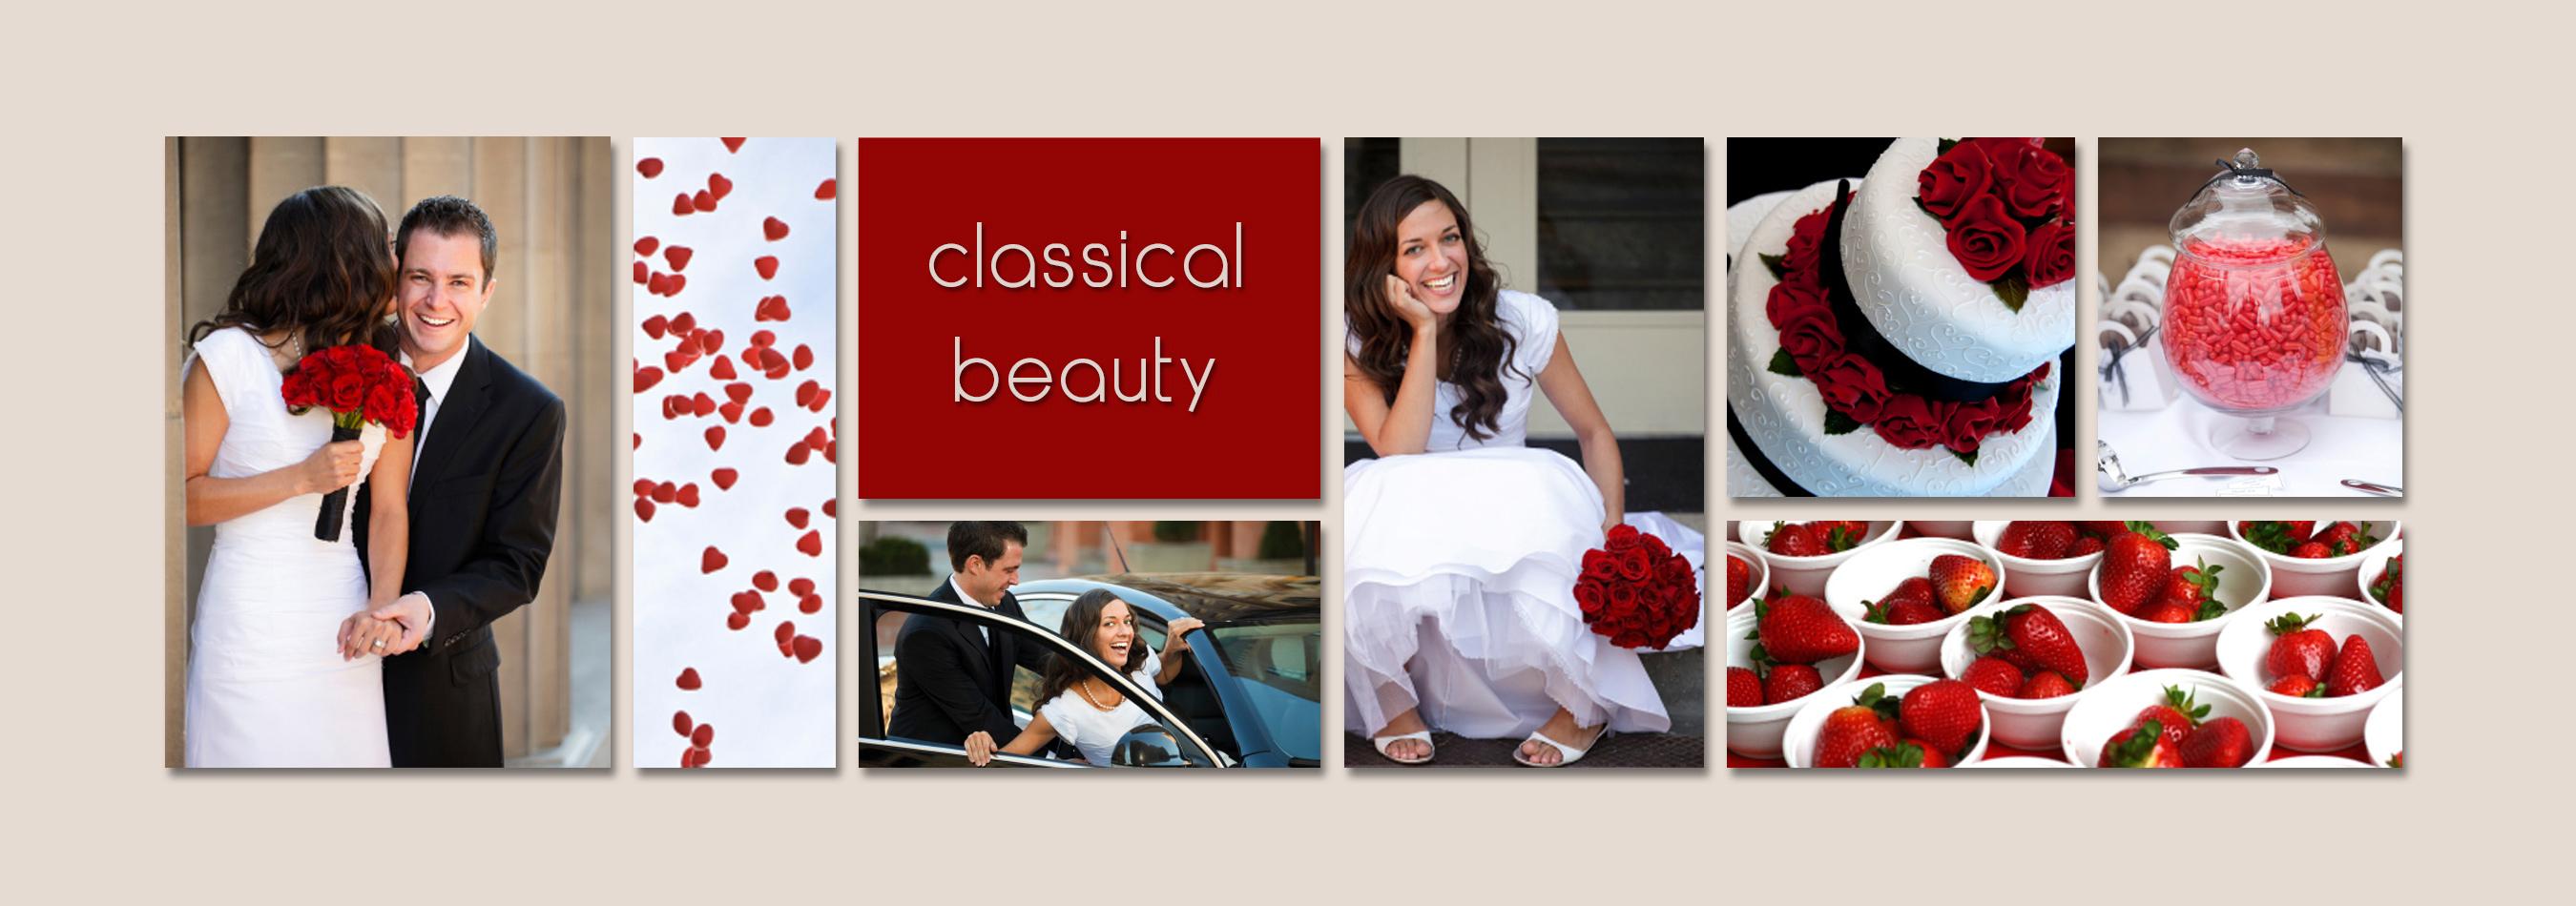 01_classical-beauty.jpg